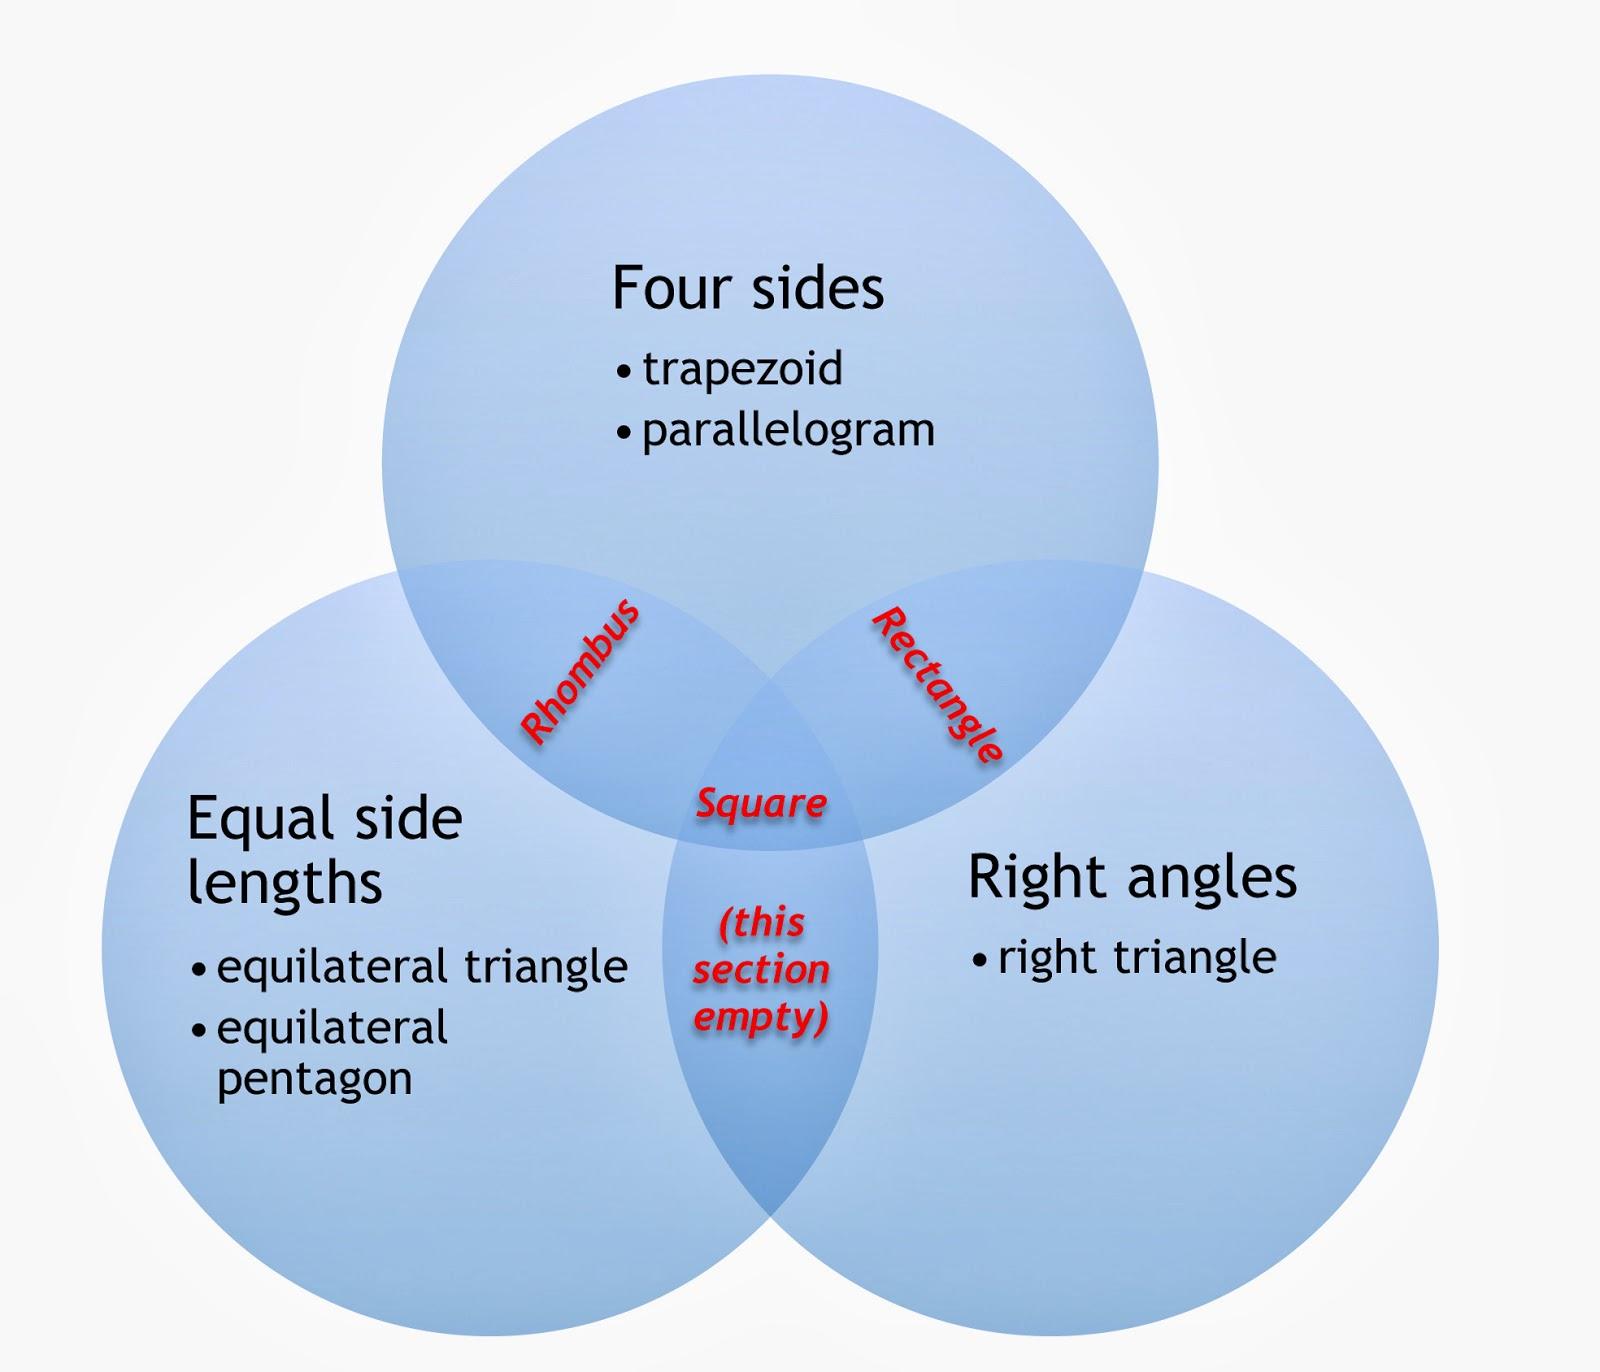 Parallelogram venn diagram doritrcatodos parallelogram venn diagram ccuart Gallery